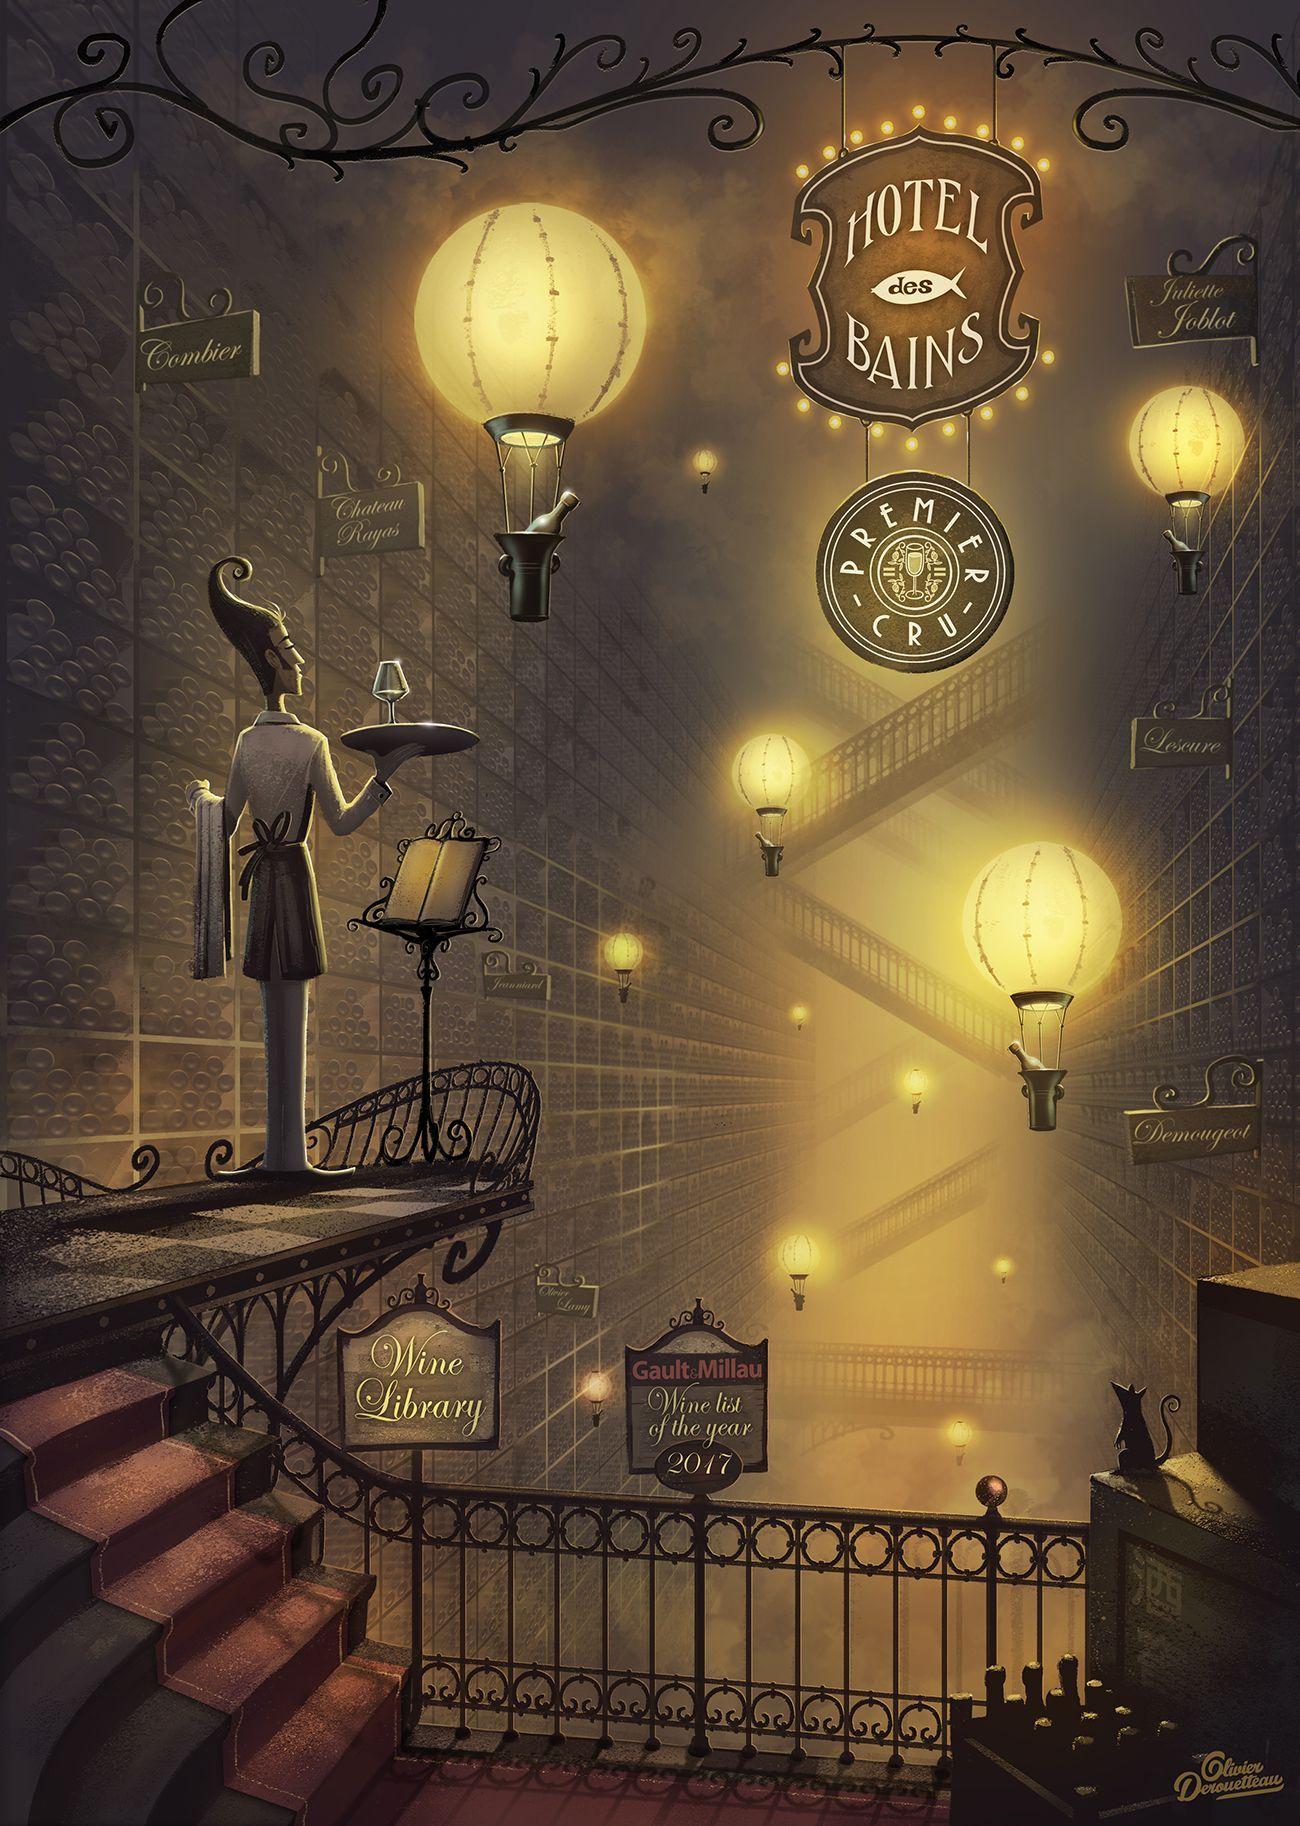 Secret wine library by olivier derouetteau illustration d